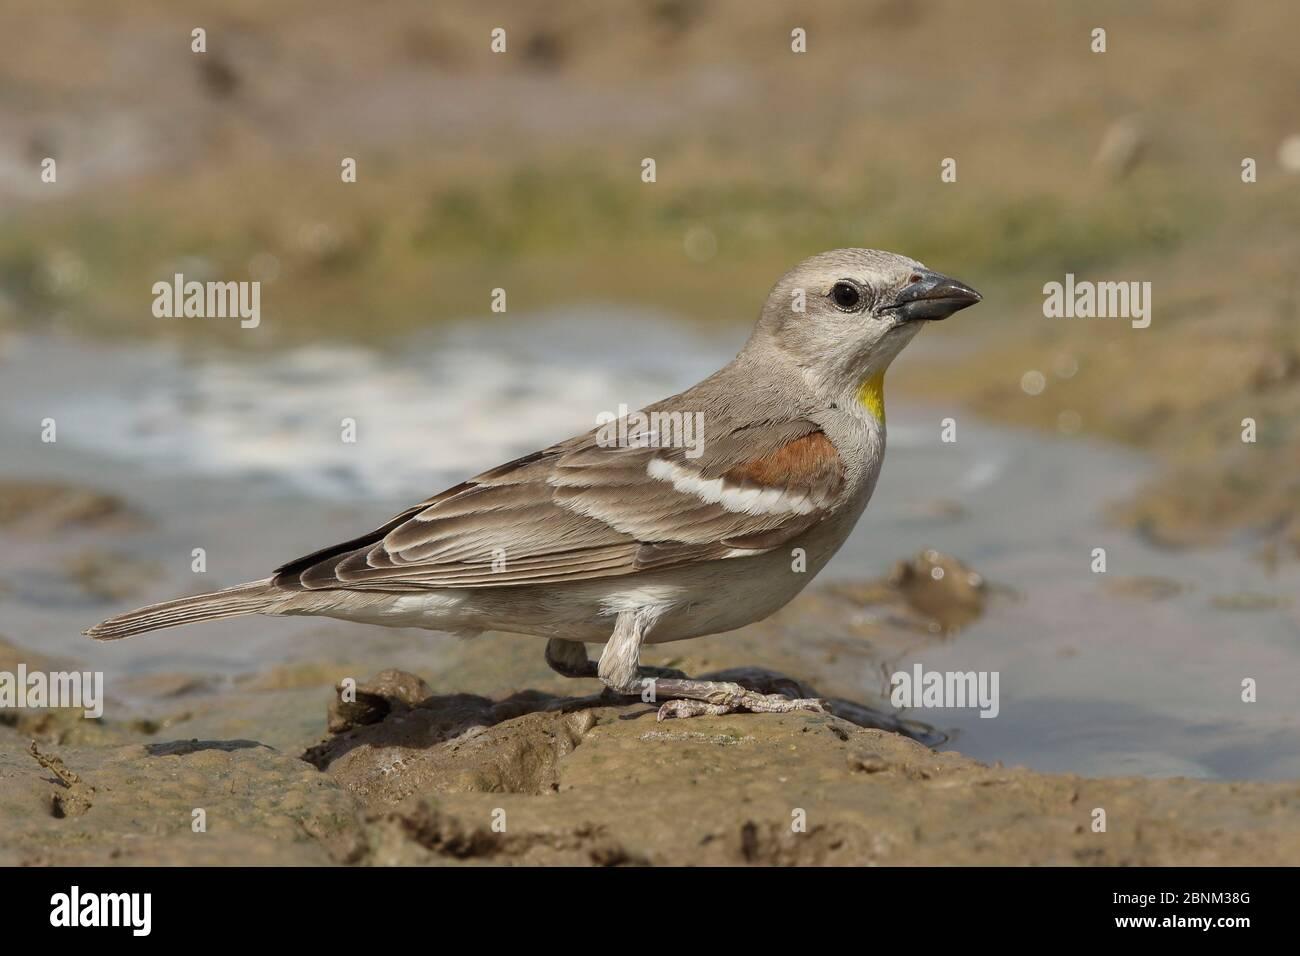 Yellow throated sparrow (Gymnoris xanthocollis) male at water, Oman, April Stock Photo